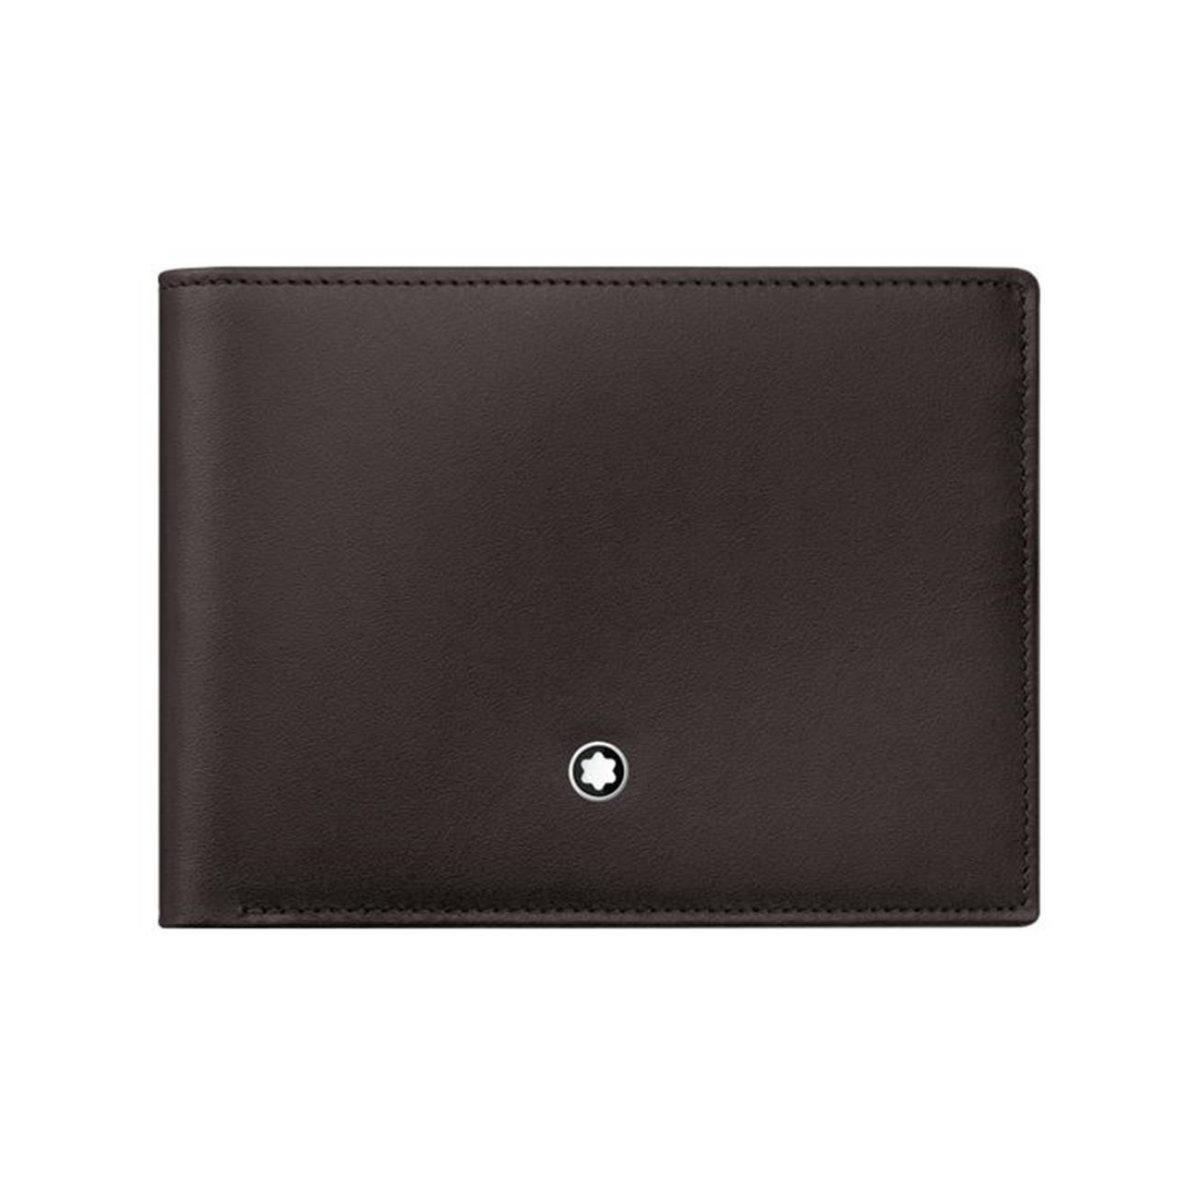 114541 — Montblanc Mst Wallet 6Cc Brown